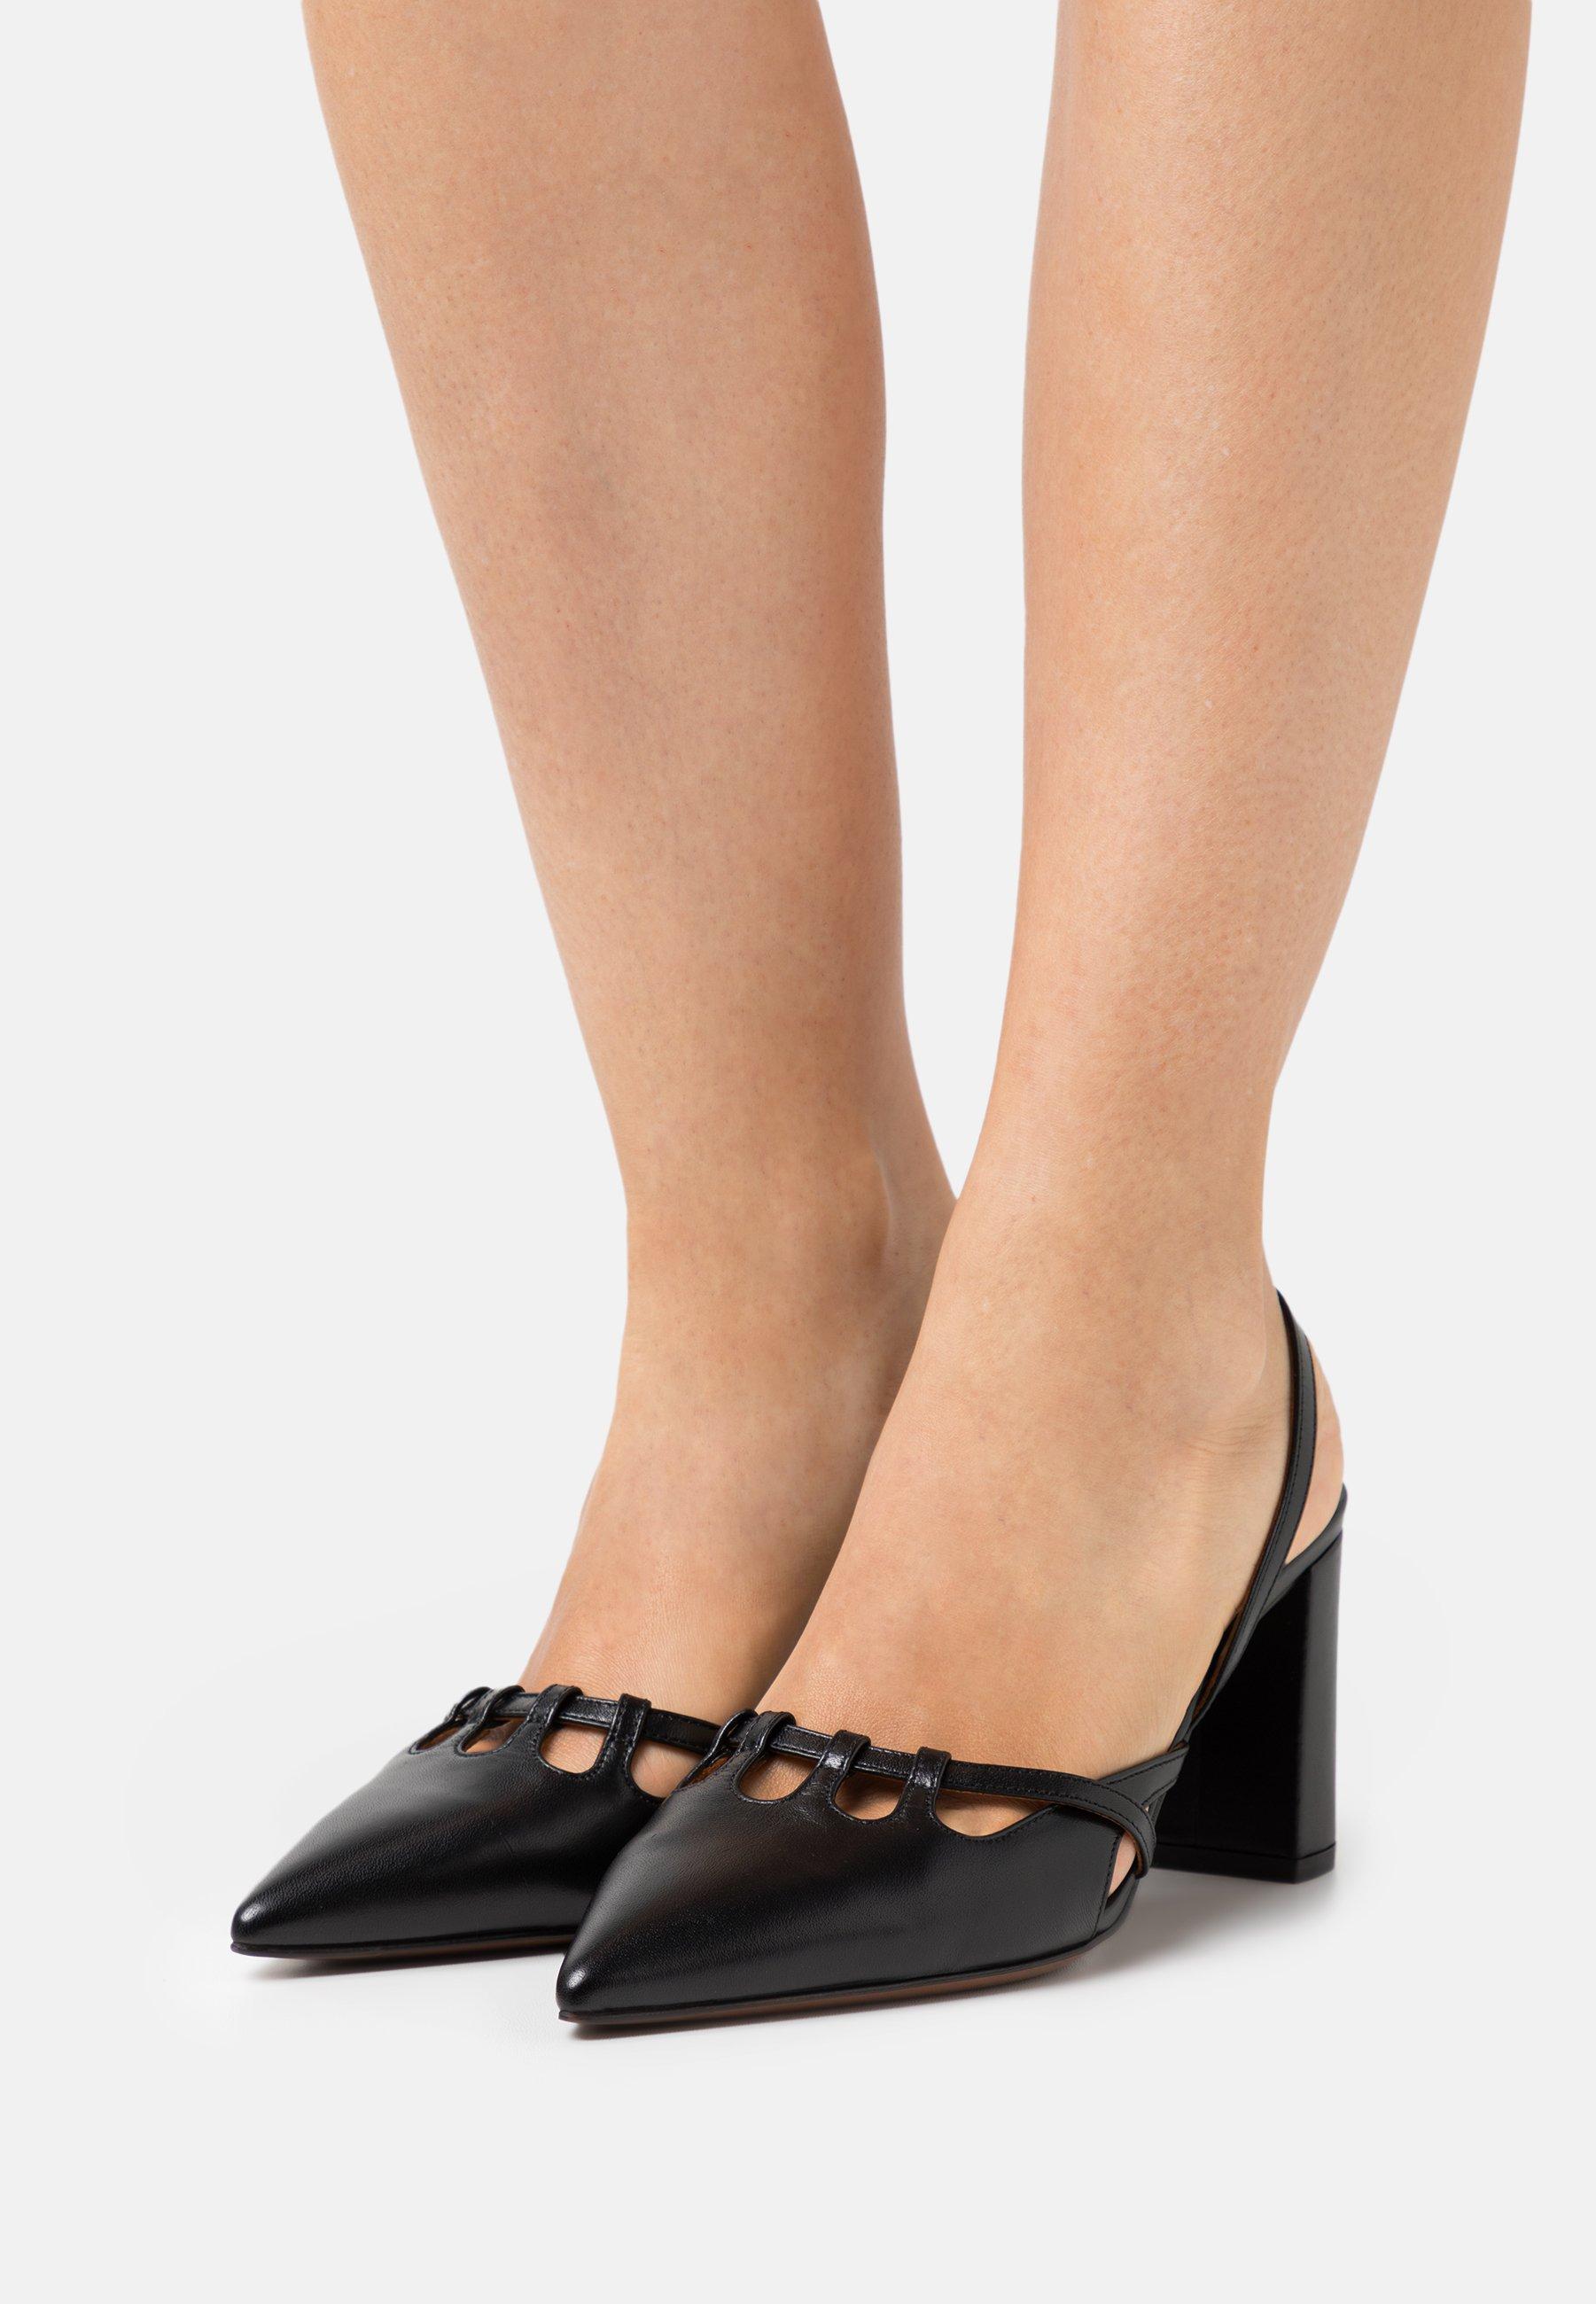 Femme SLINGBACK - Escarpins - black